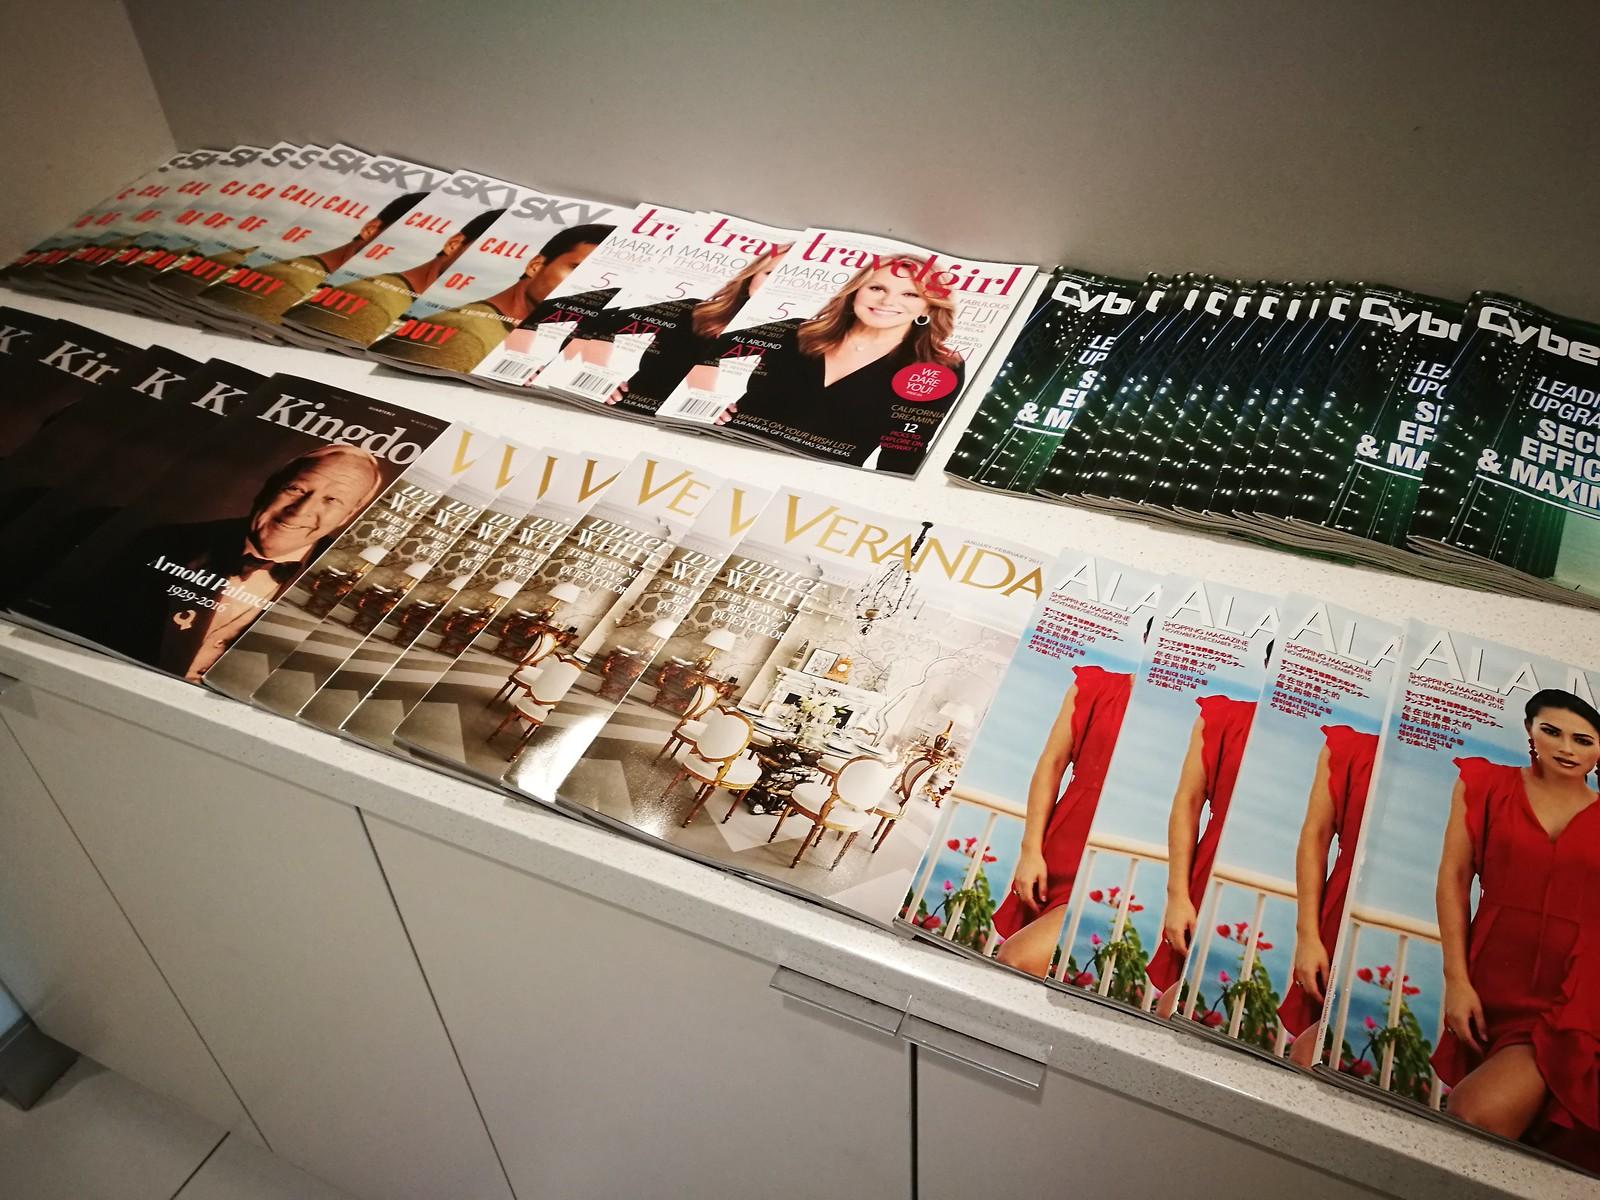 Magazine on the cabinet